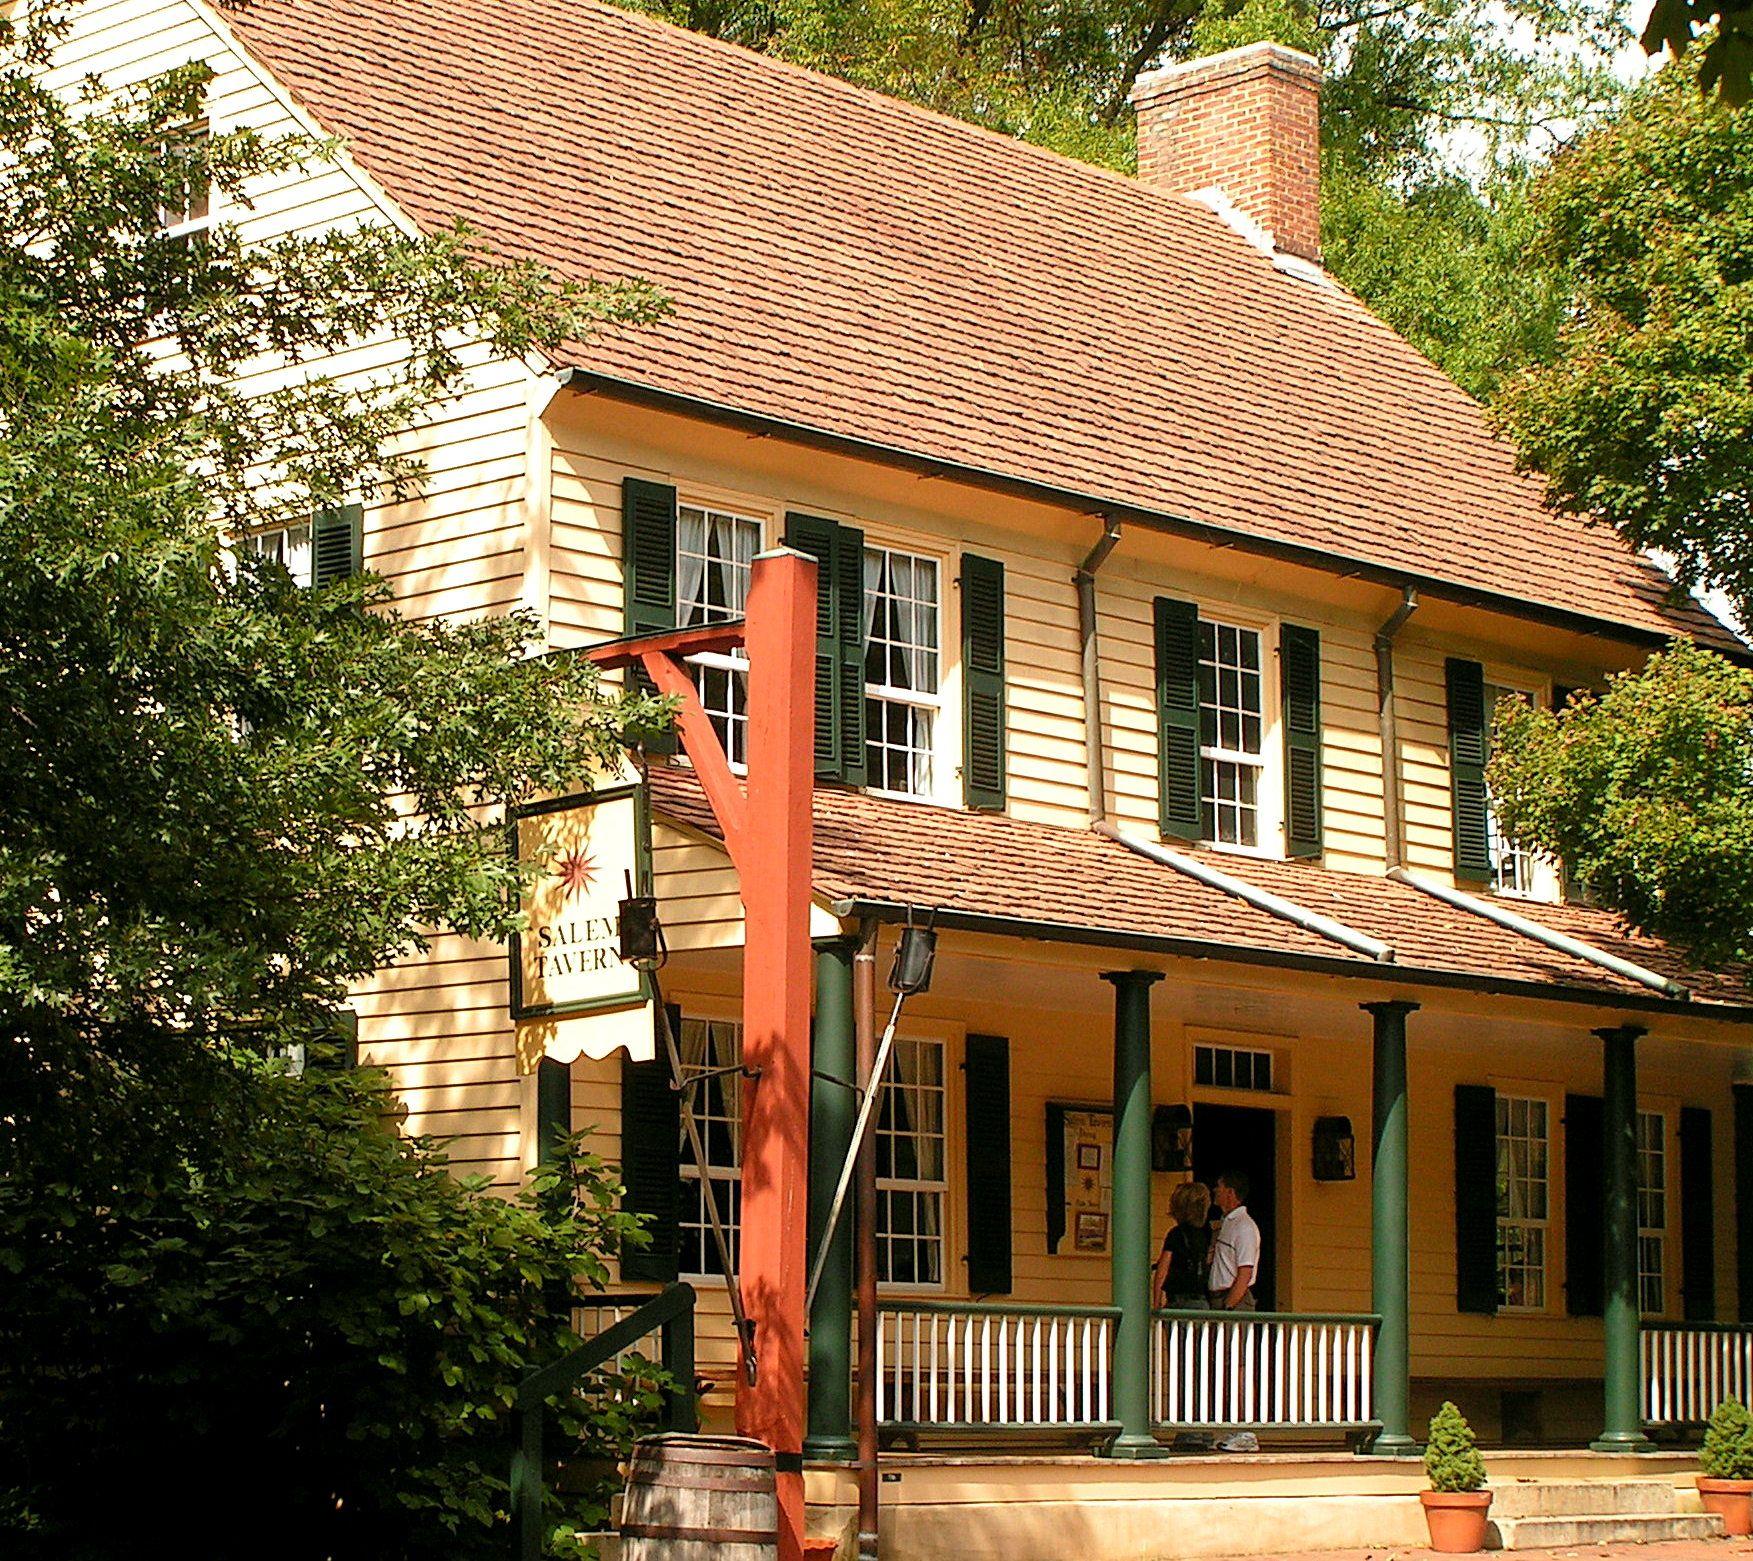 Modern Homeexterior Design Ideas: Old Salem - Street Scene - Photo Taken 2007.